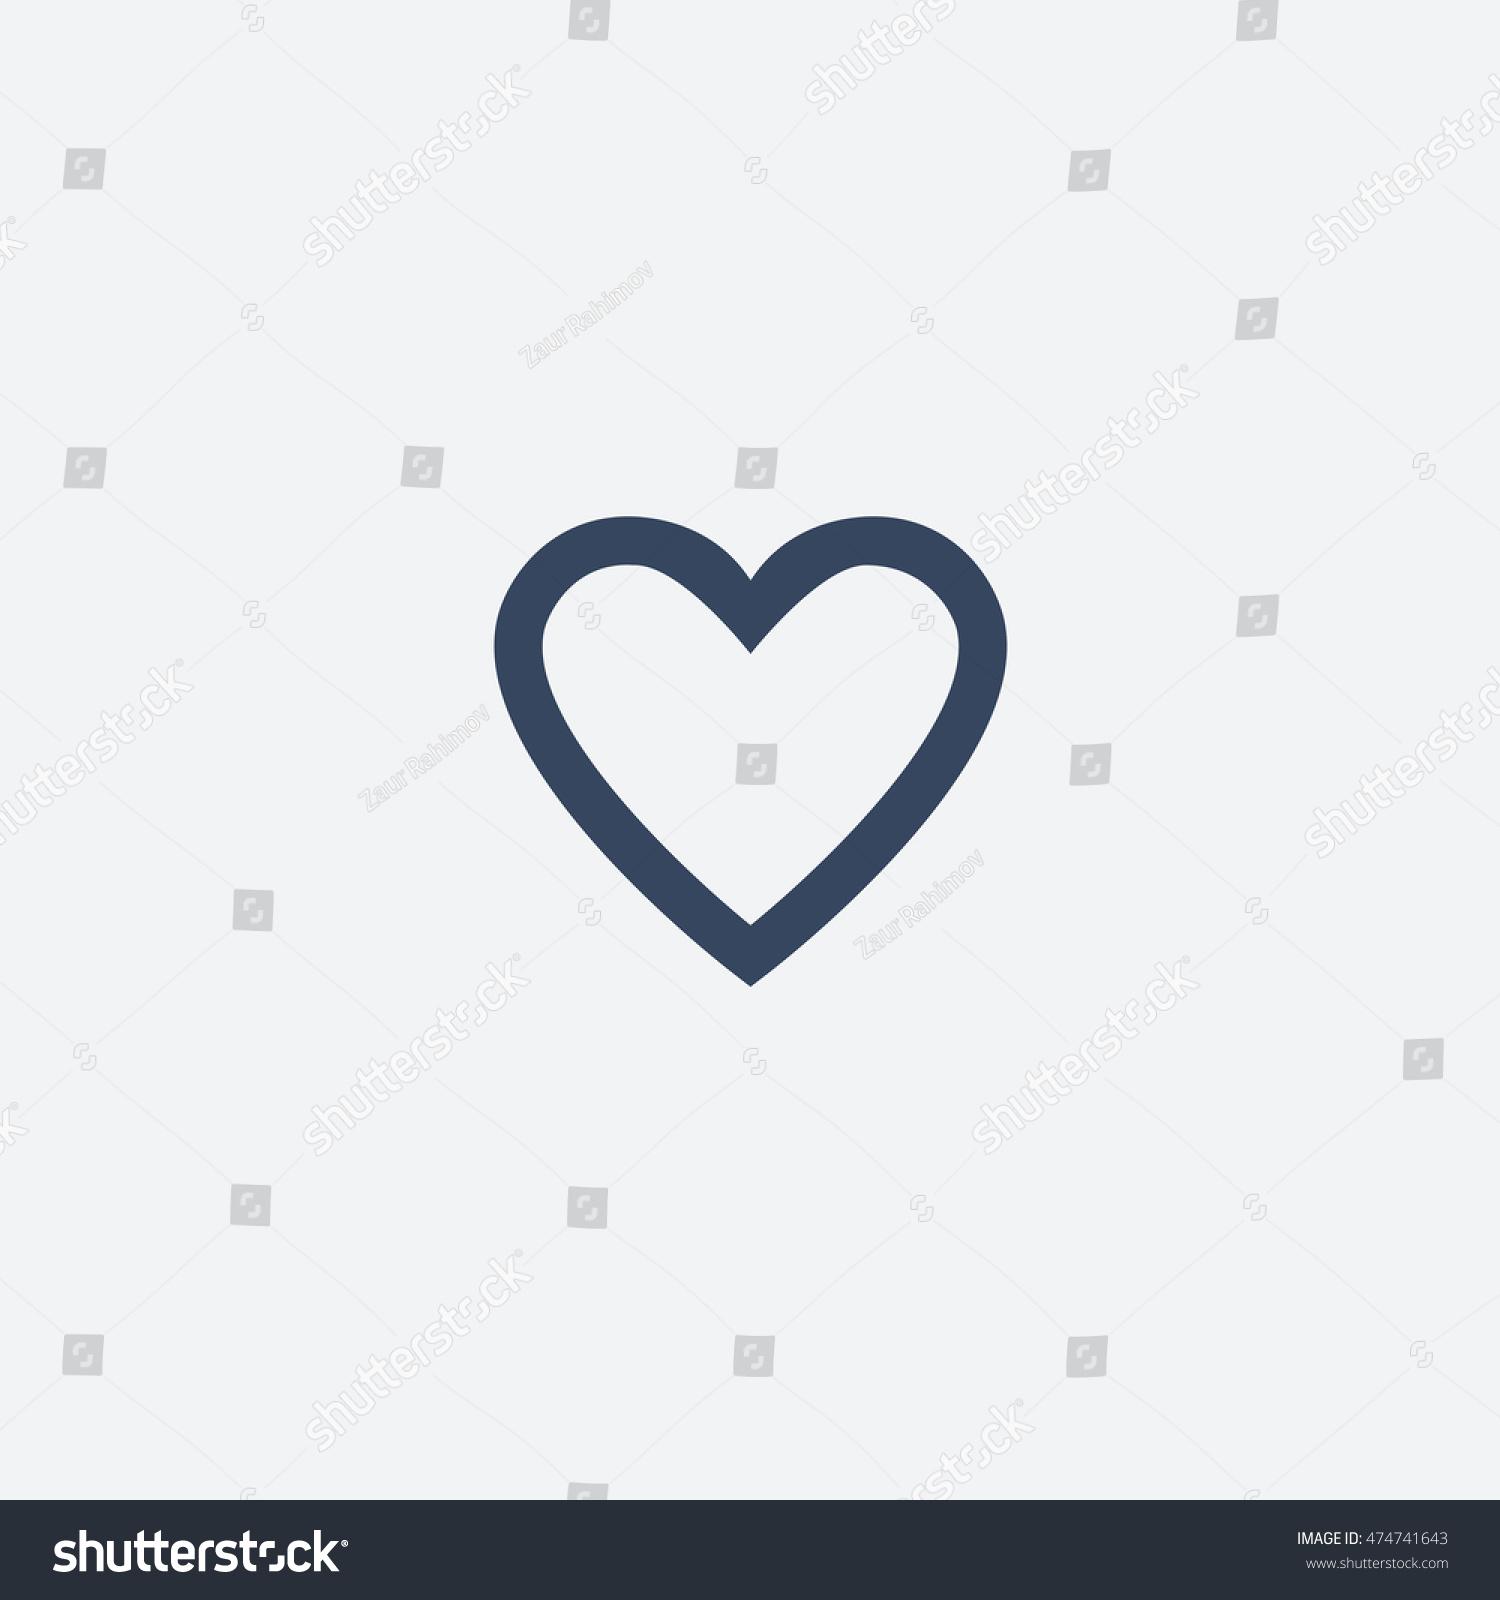 Tumblr Like Heart Icon Vector Isolated Stock-Vektorgrafik ...